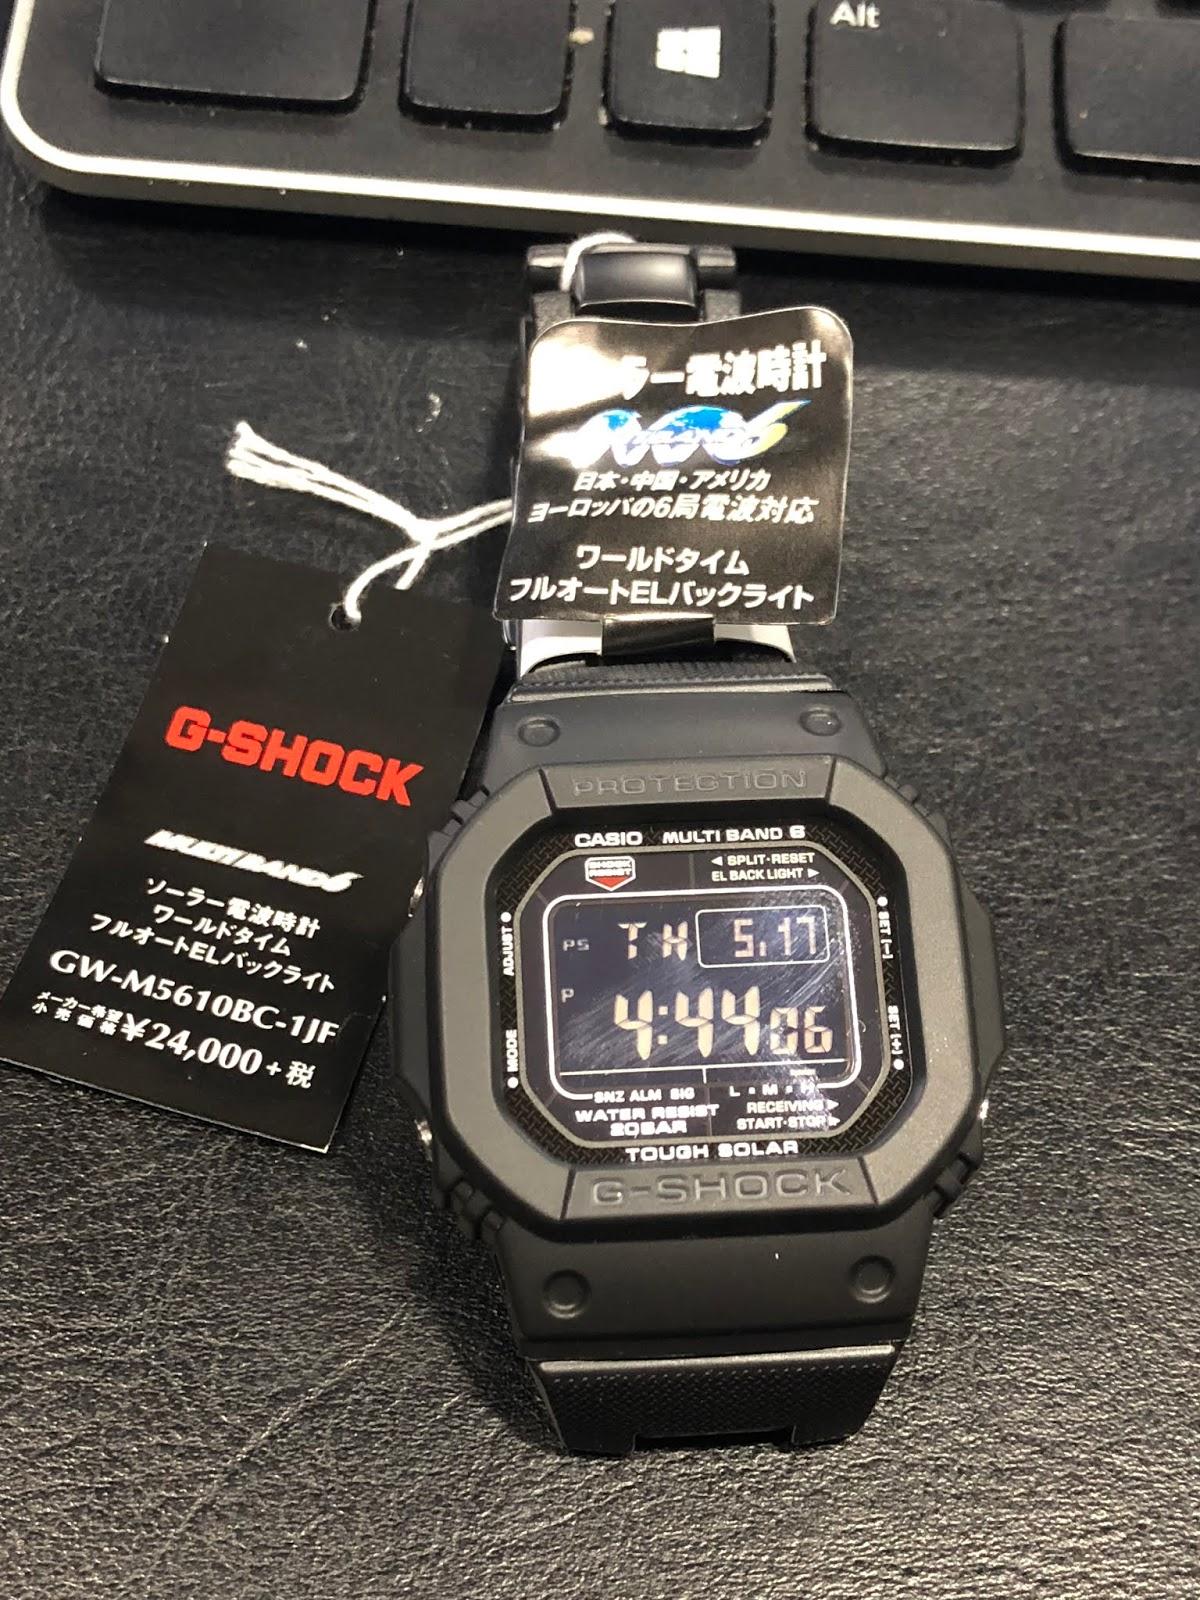 3b09791b66243 My Eastern Watch Collection  Casio G-Shock GW-M5610BC-1JF JDM Multi ...